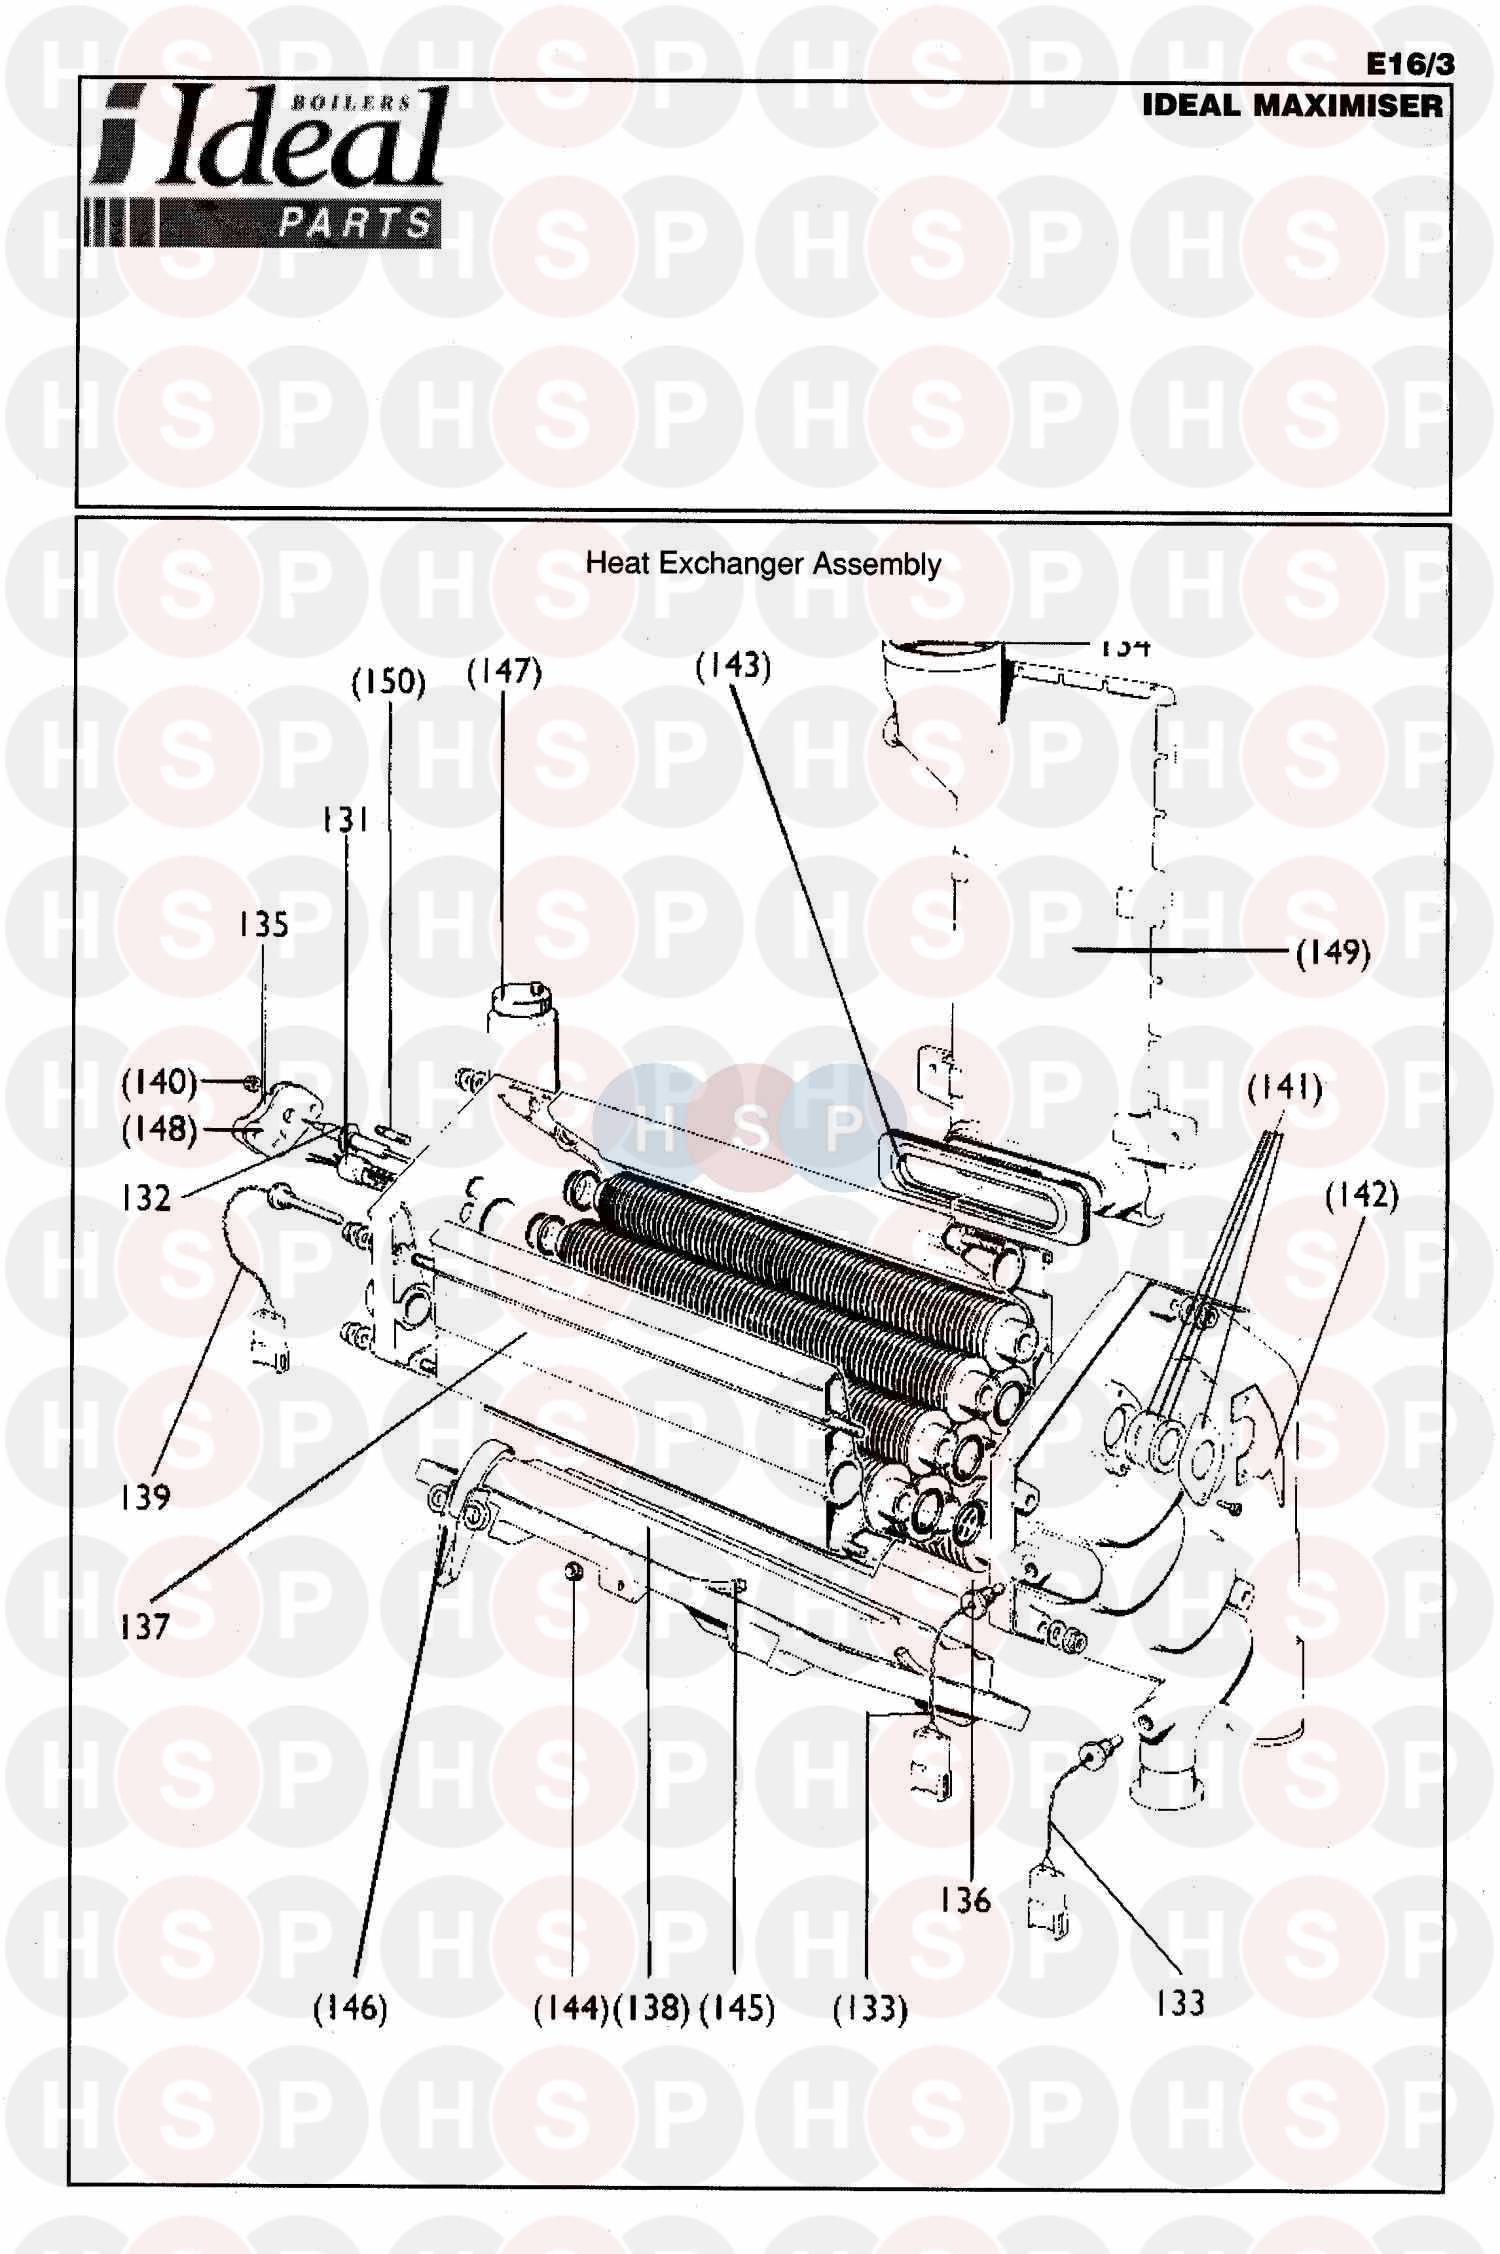 ideal maximiser appliance diagram  boiler assembly 1